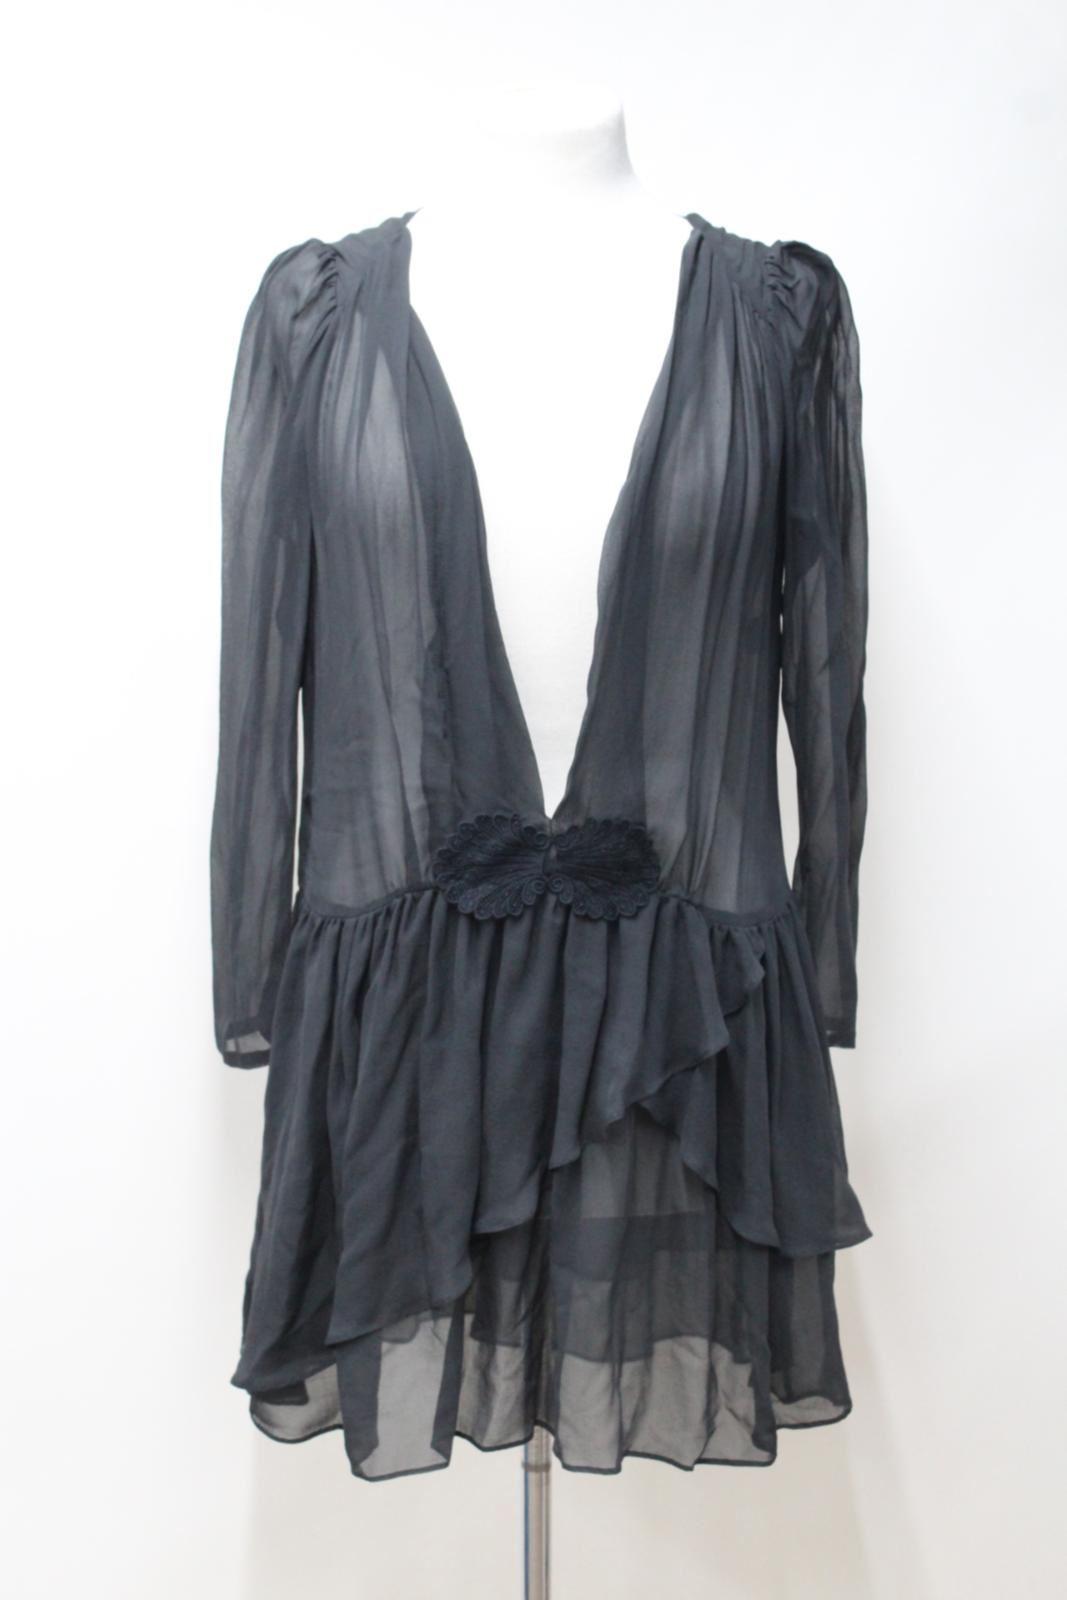 MASSCOB-Ladies-Dark-Grey-Sheer-Silk-Chiffon-Deep-V-Neck-Long-Sleeve-Dress-M